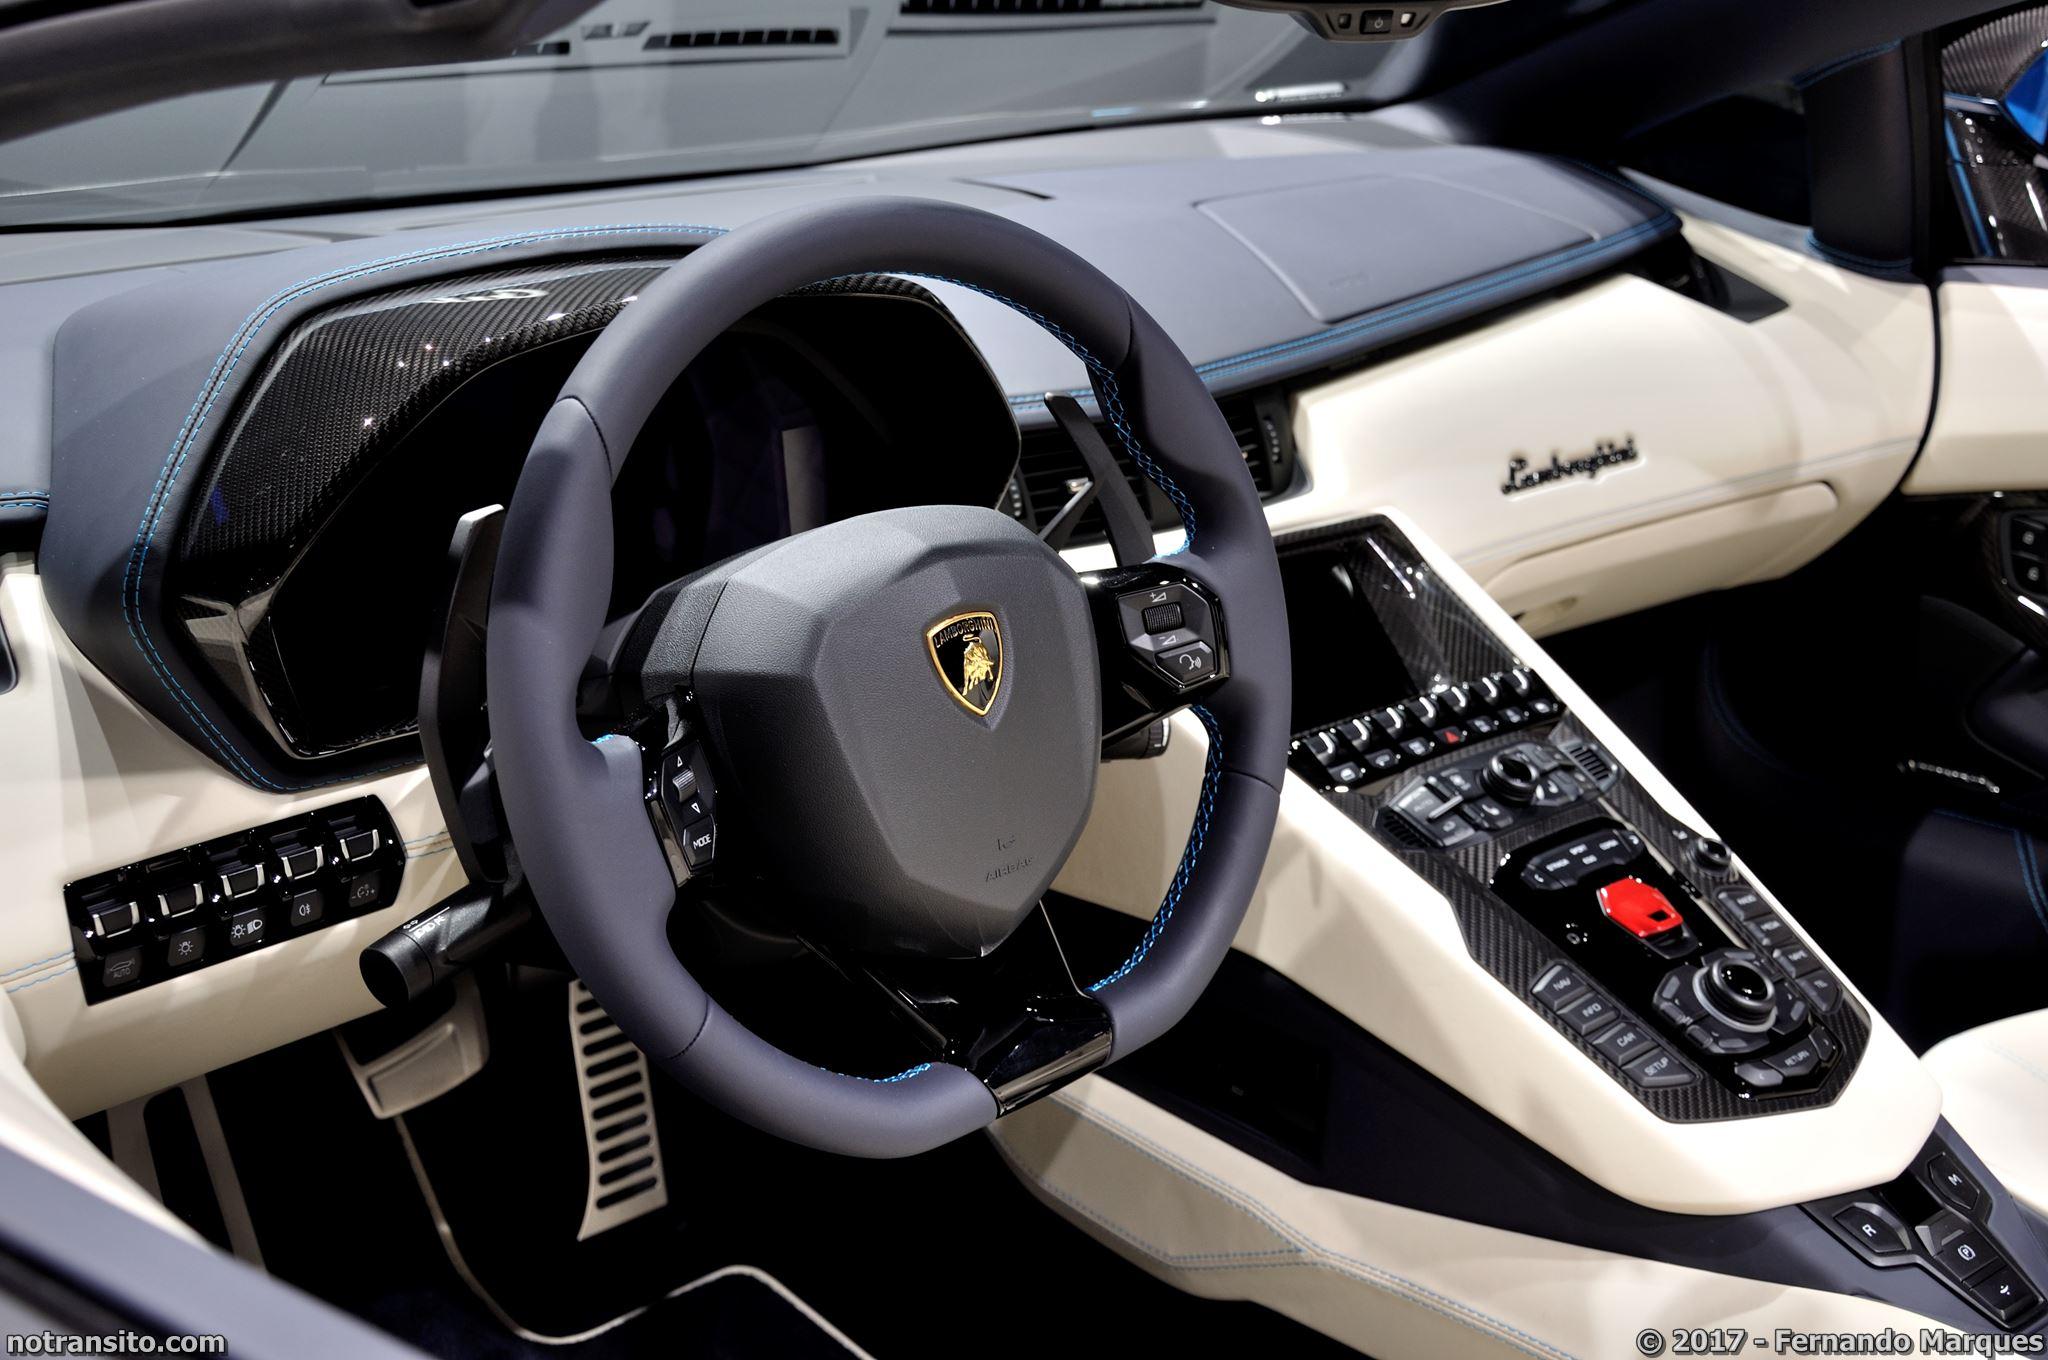 Lamborghini-Aventador-S-Roadster-Frankfurt-2017-007